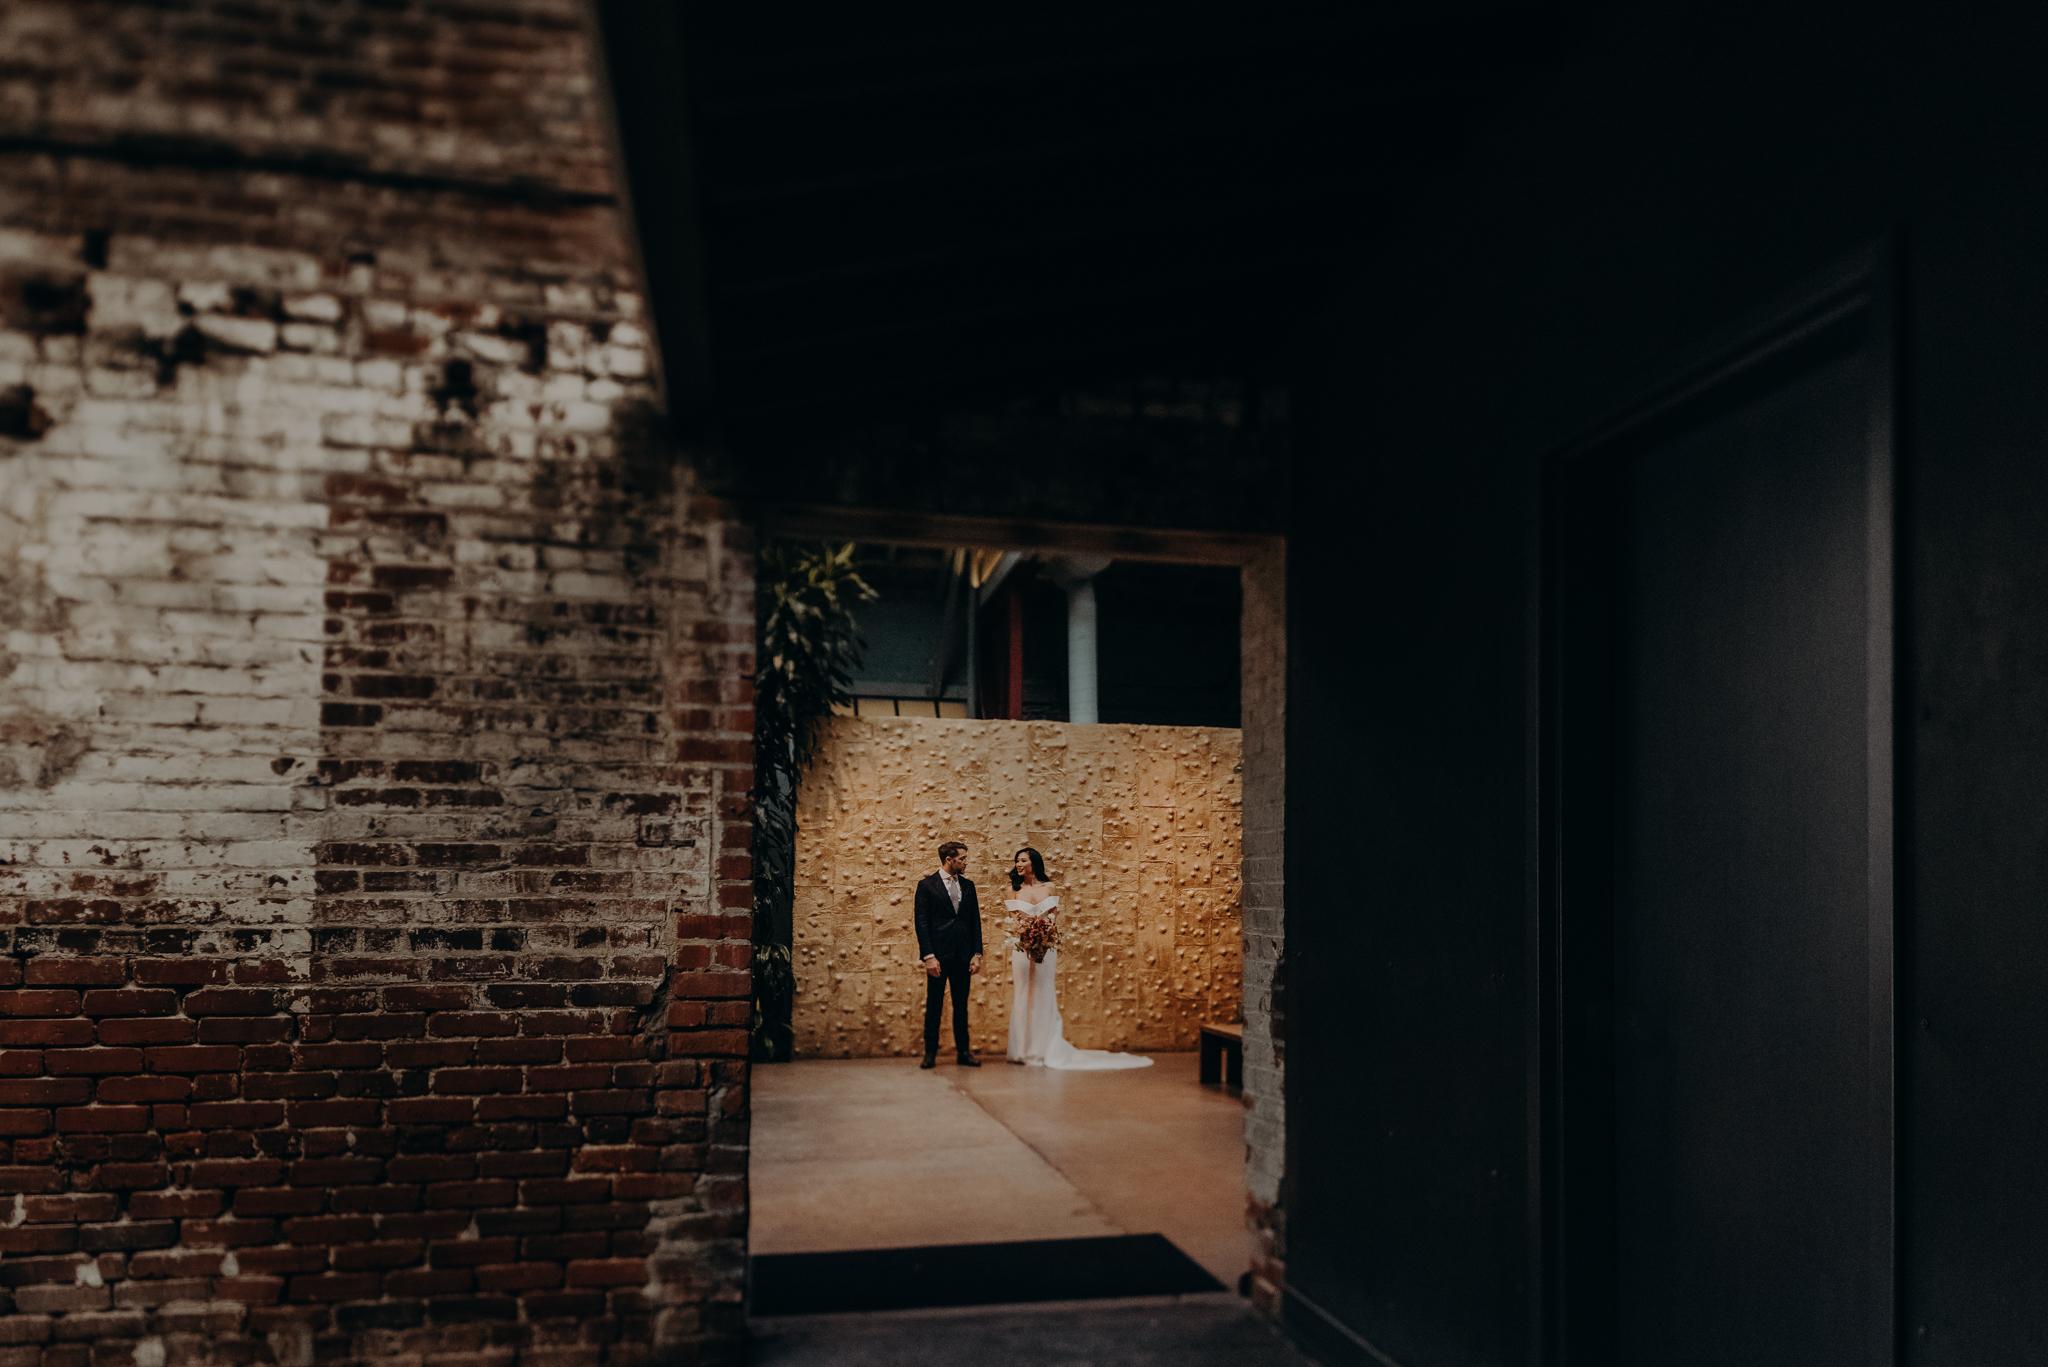 Wedding Photo LA - wedding photographer in los angeles - millwick wedding venue -isaiahandtaylor.com-036.jpg